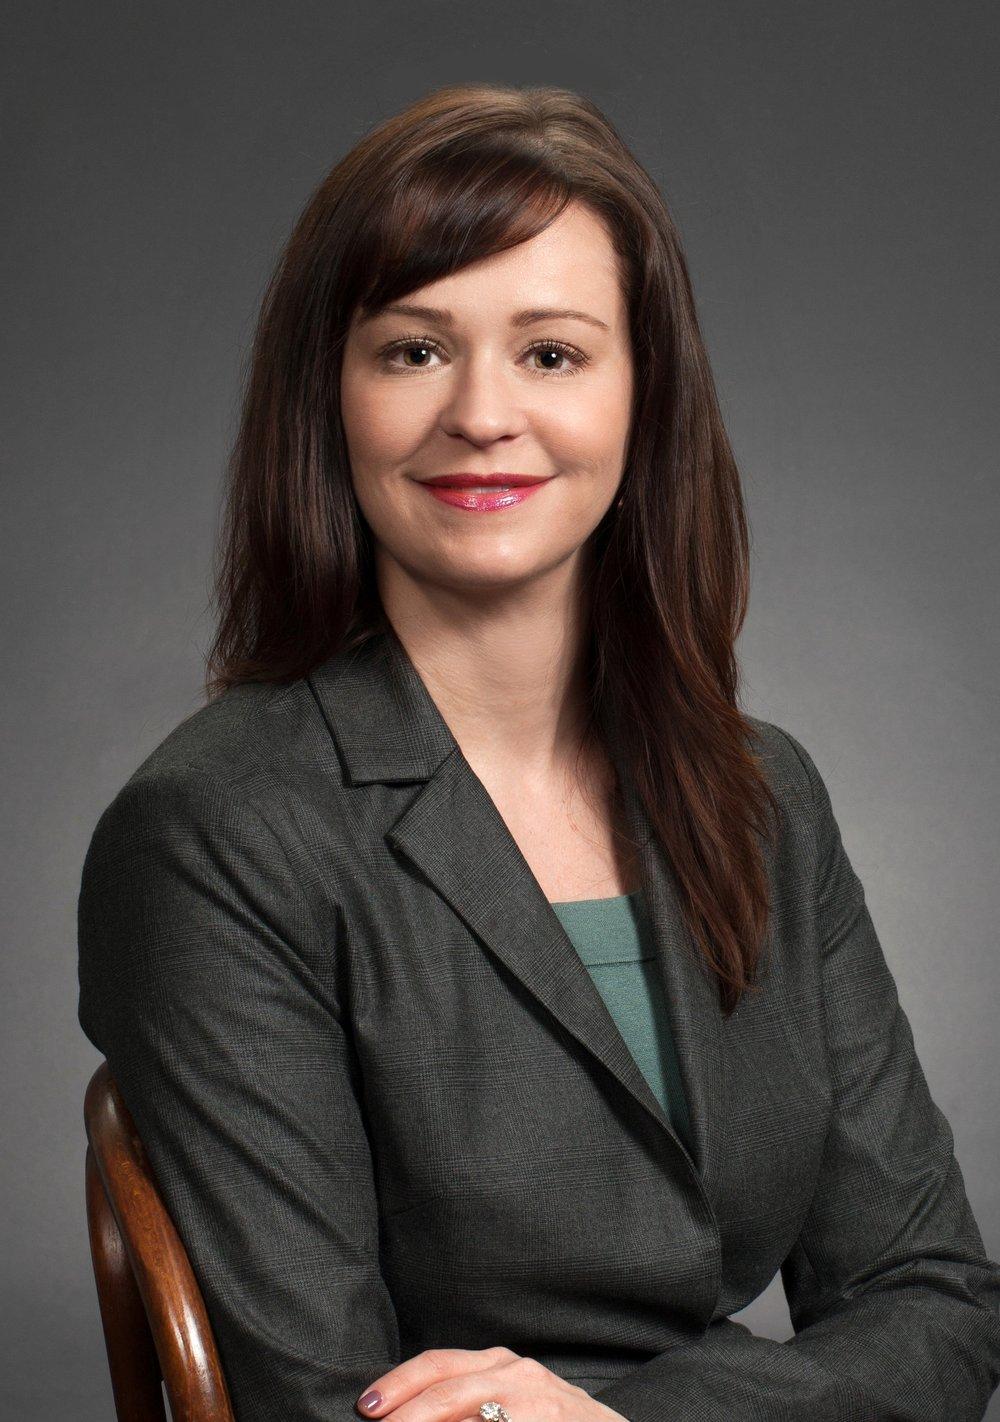 <b> Wendy Nunnelley  </b> <br>Global Consumer Goods SVP